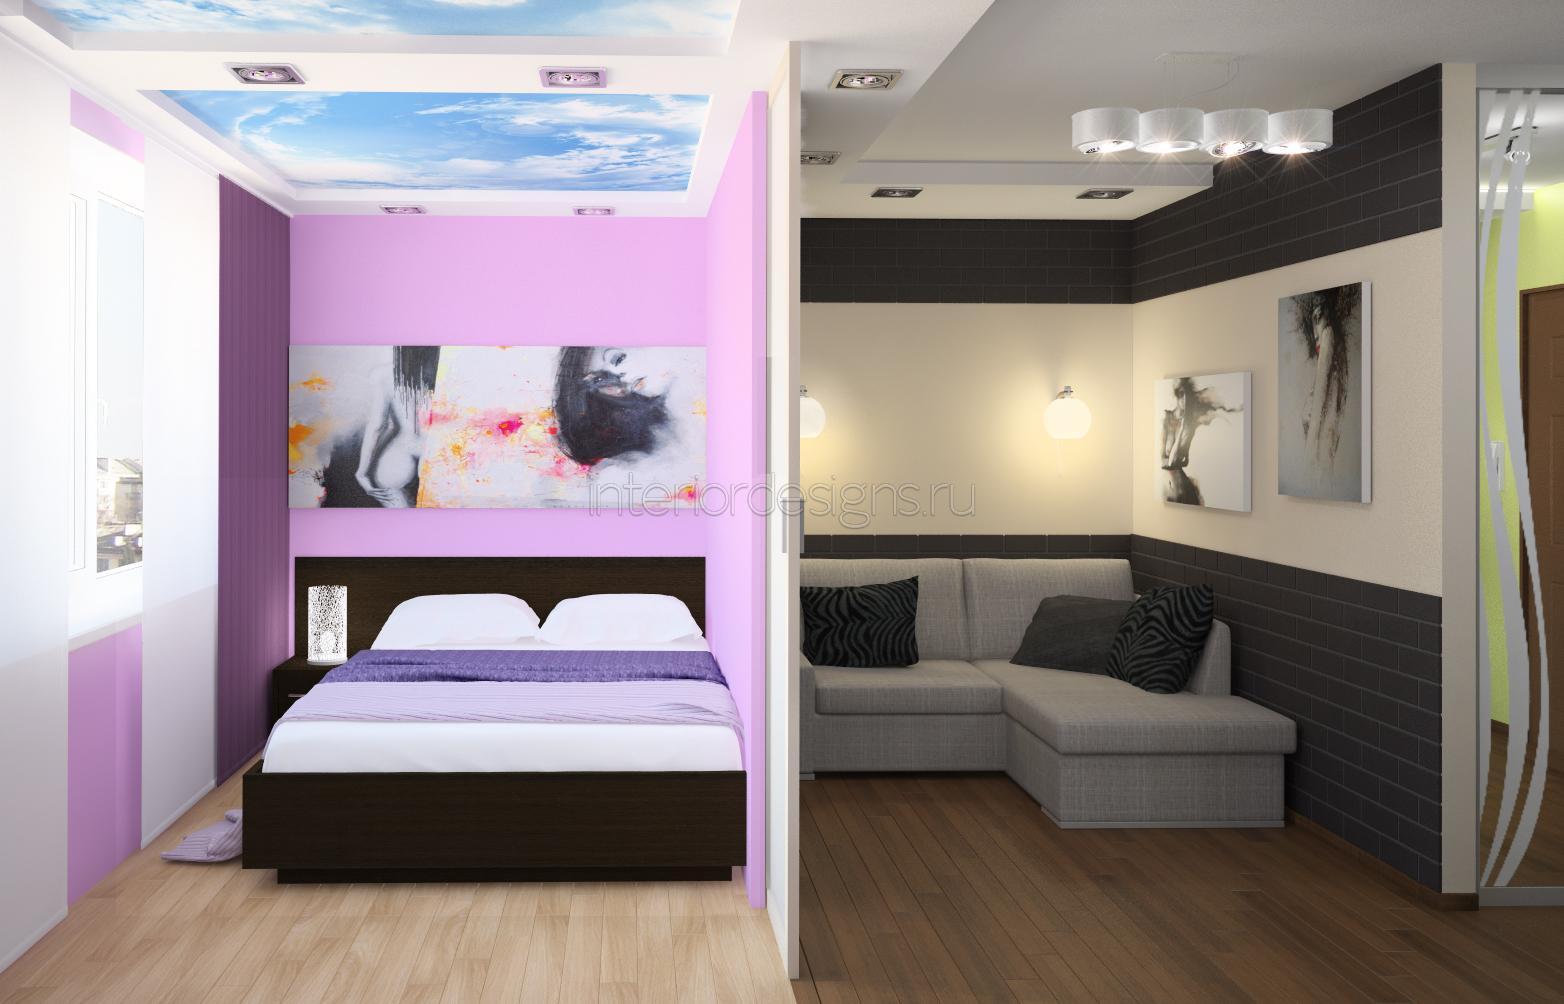 Дизайн однокомнатной квартиры с ребенком - примеры интерьера 38